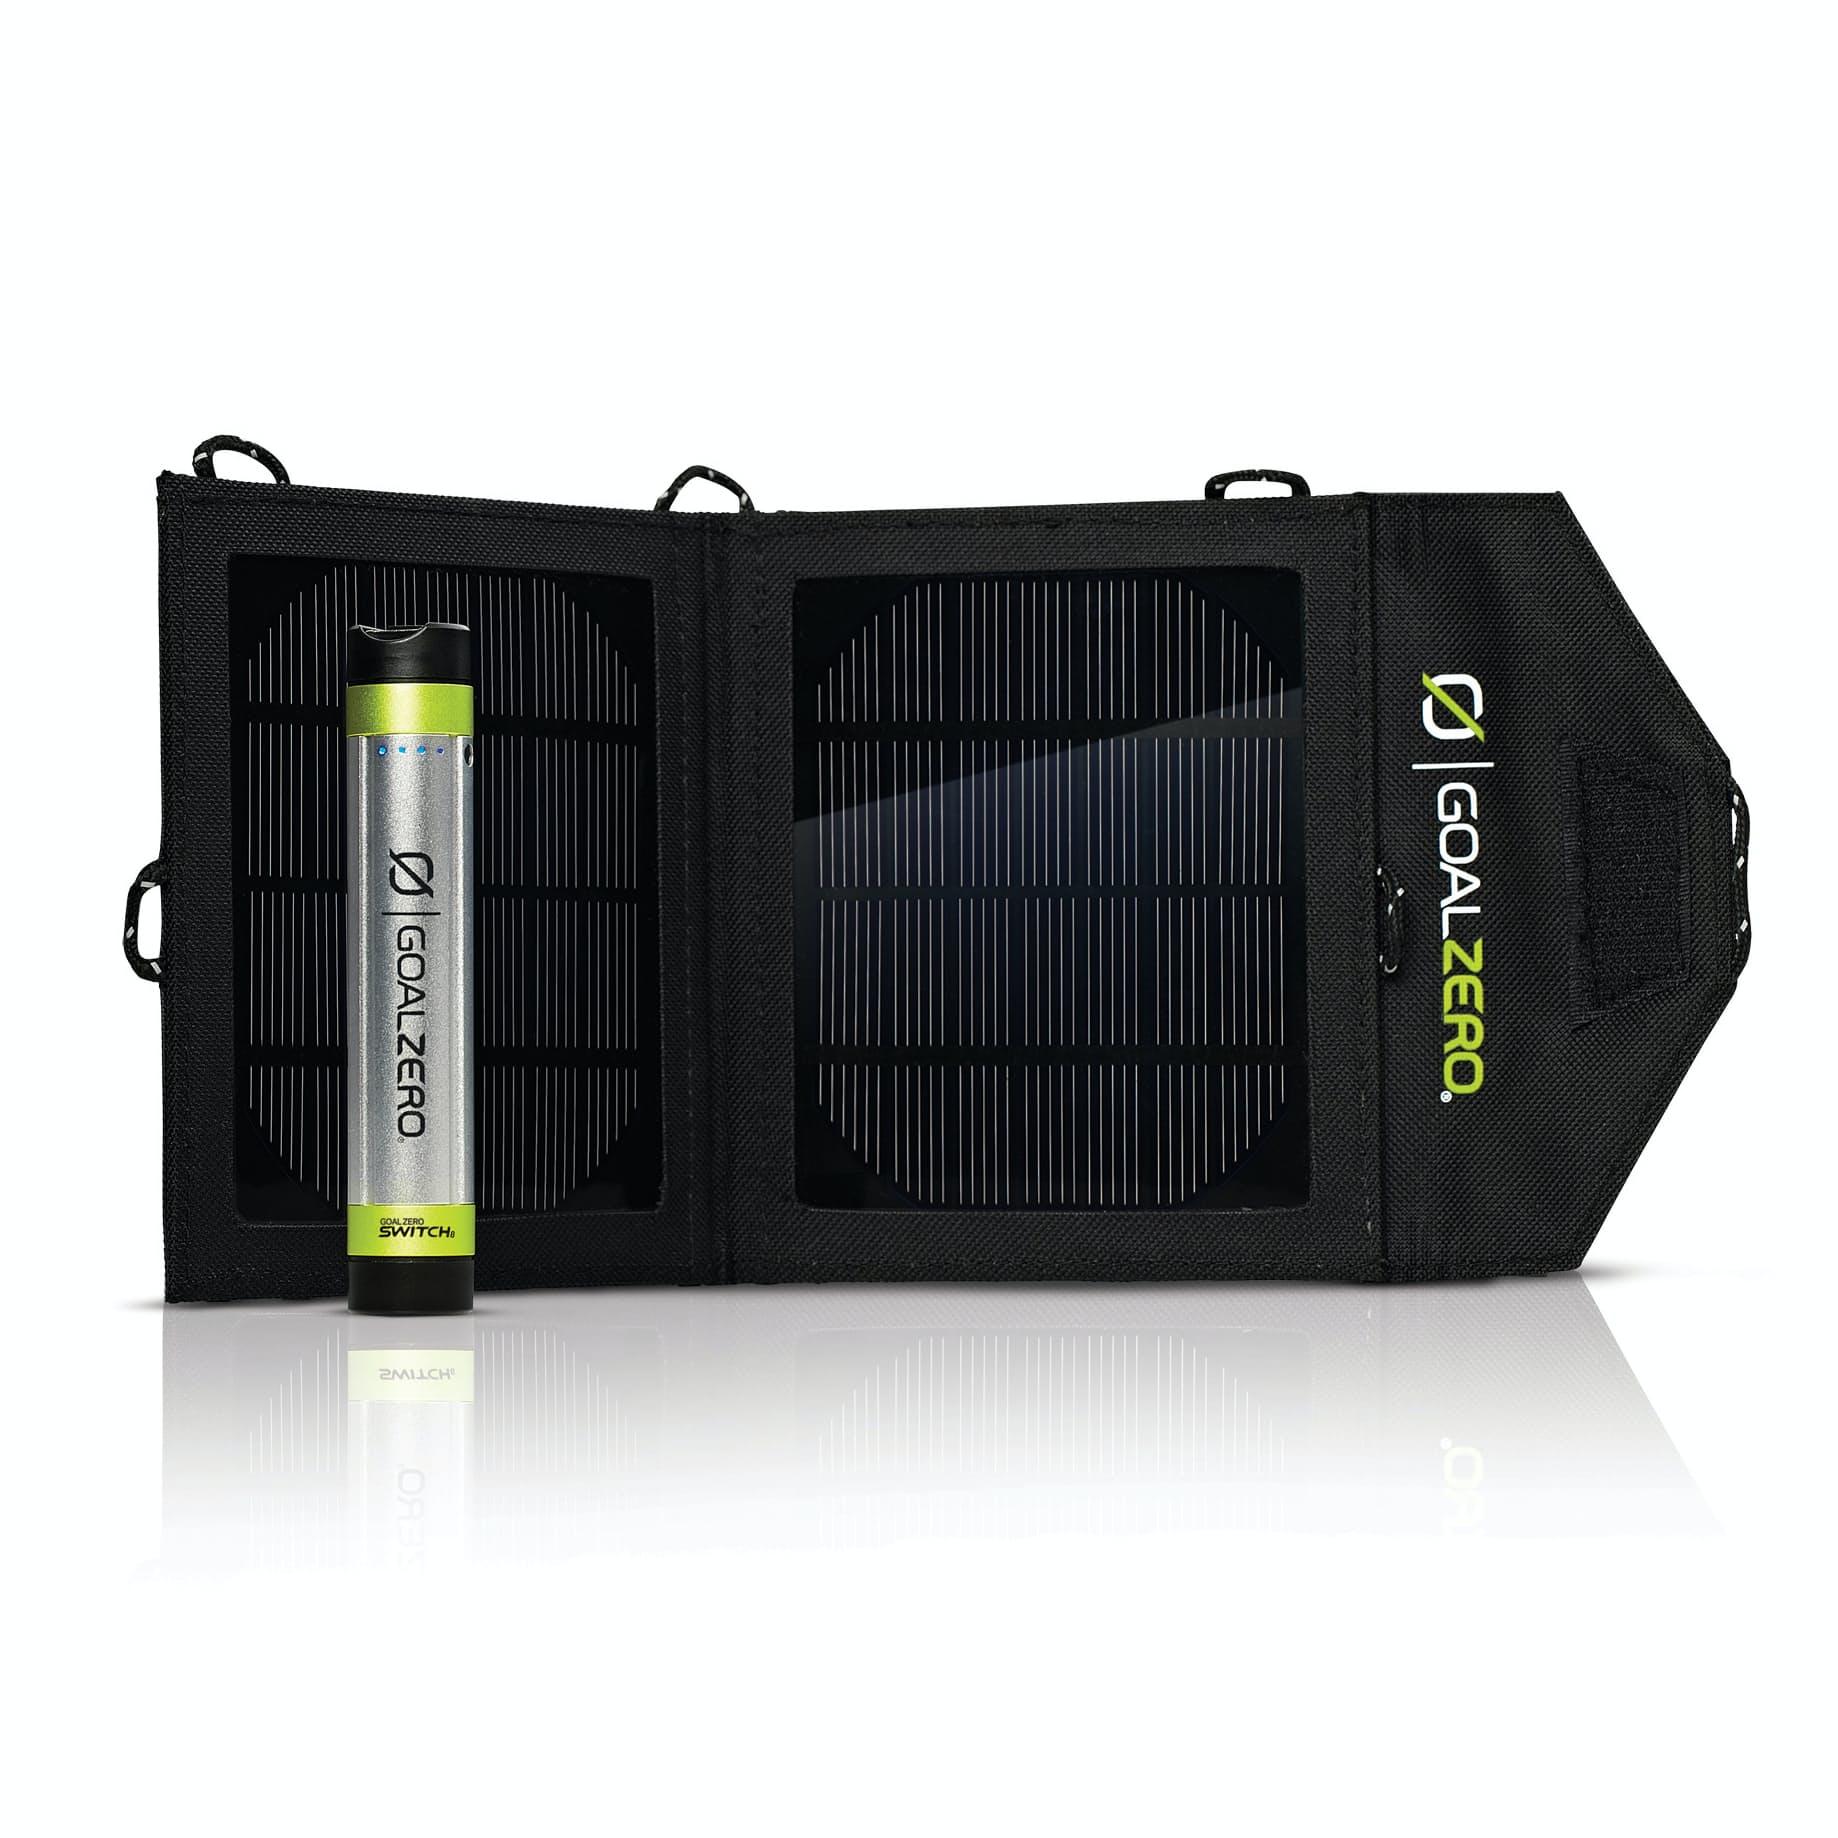 Leqjfr6kng goal zero switch 10 micro solar recharging kit 0 original